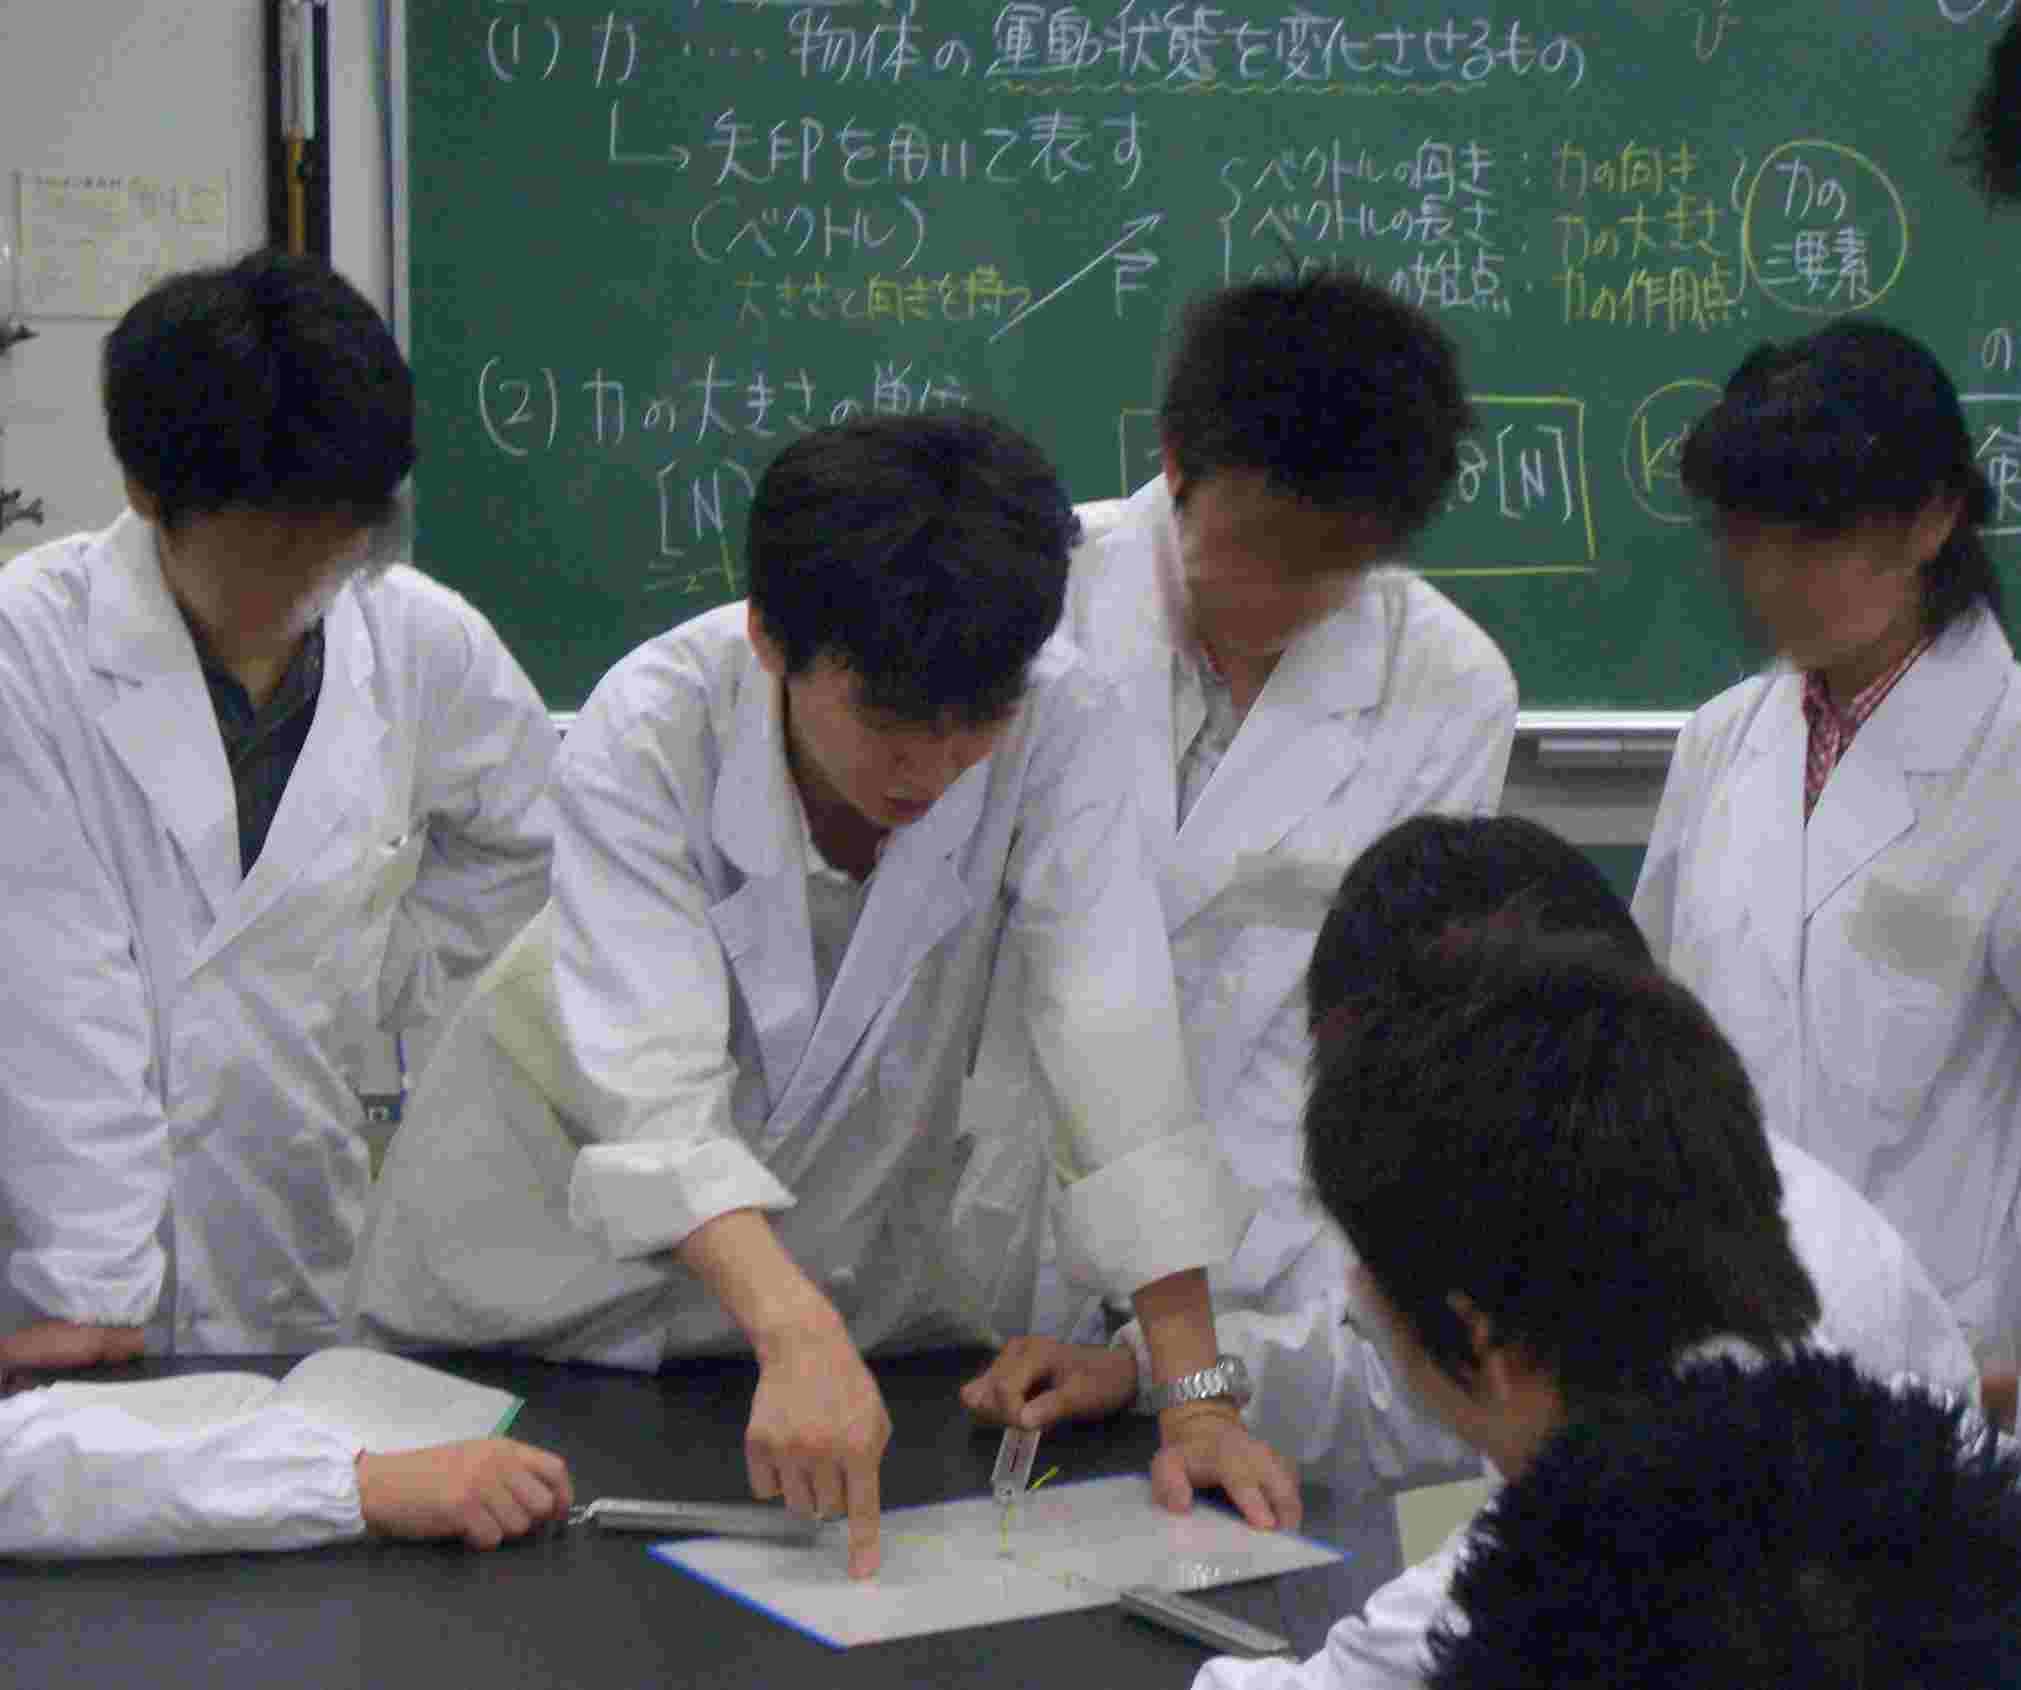 <b>東京工業大学附属</b>科学技術<b>高等学校</b> 理科・物理